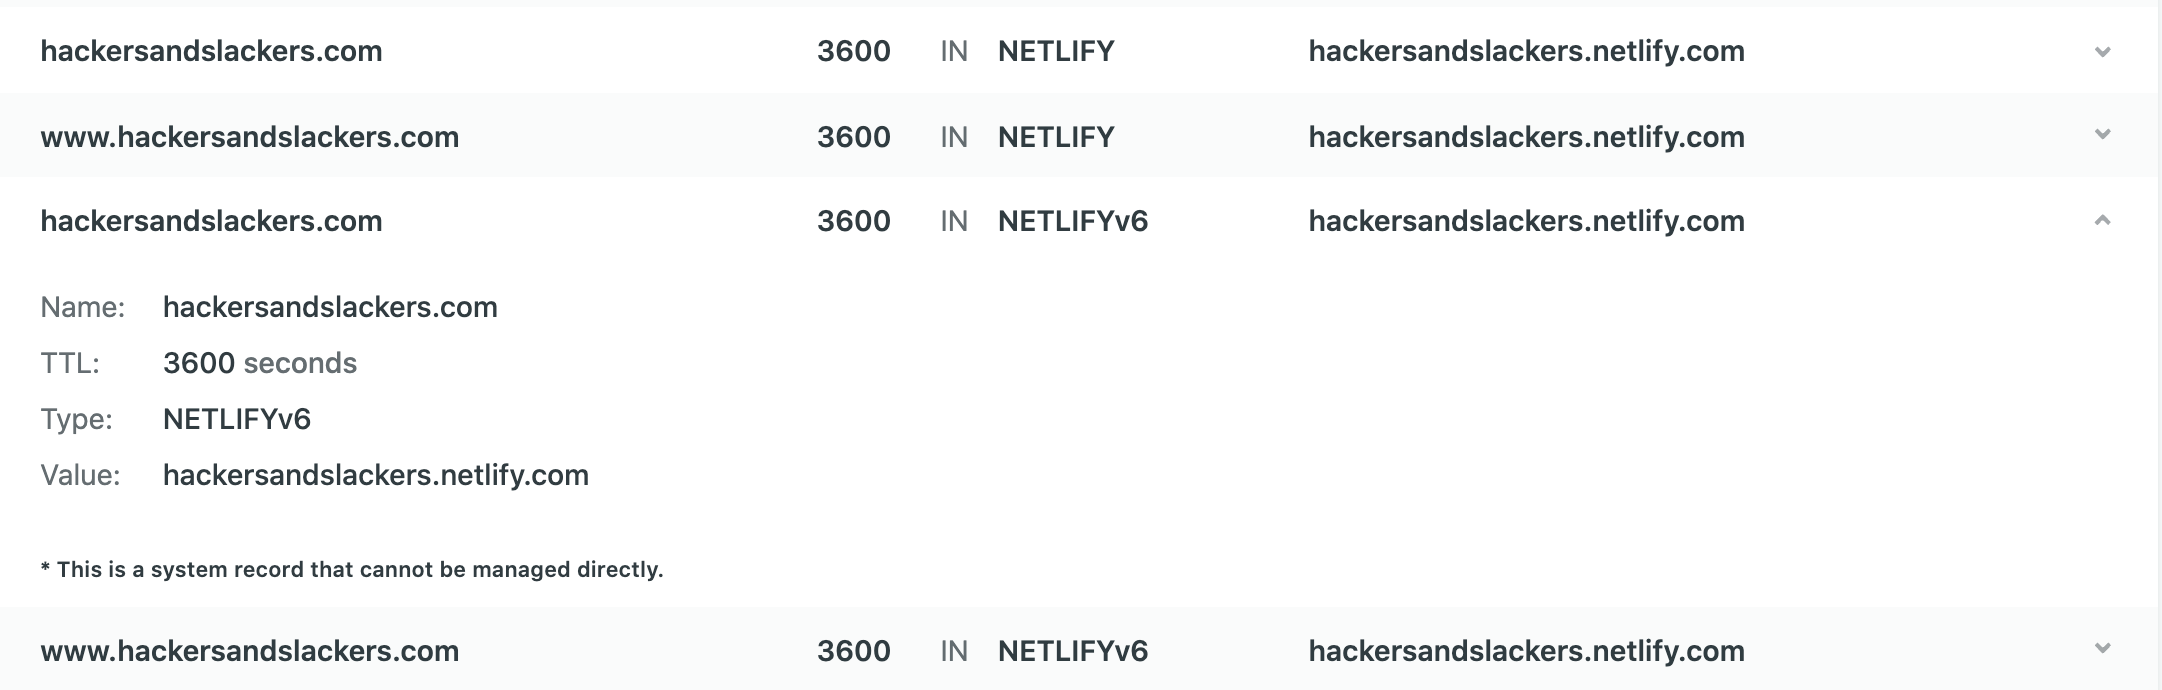 Creating DNS records